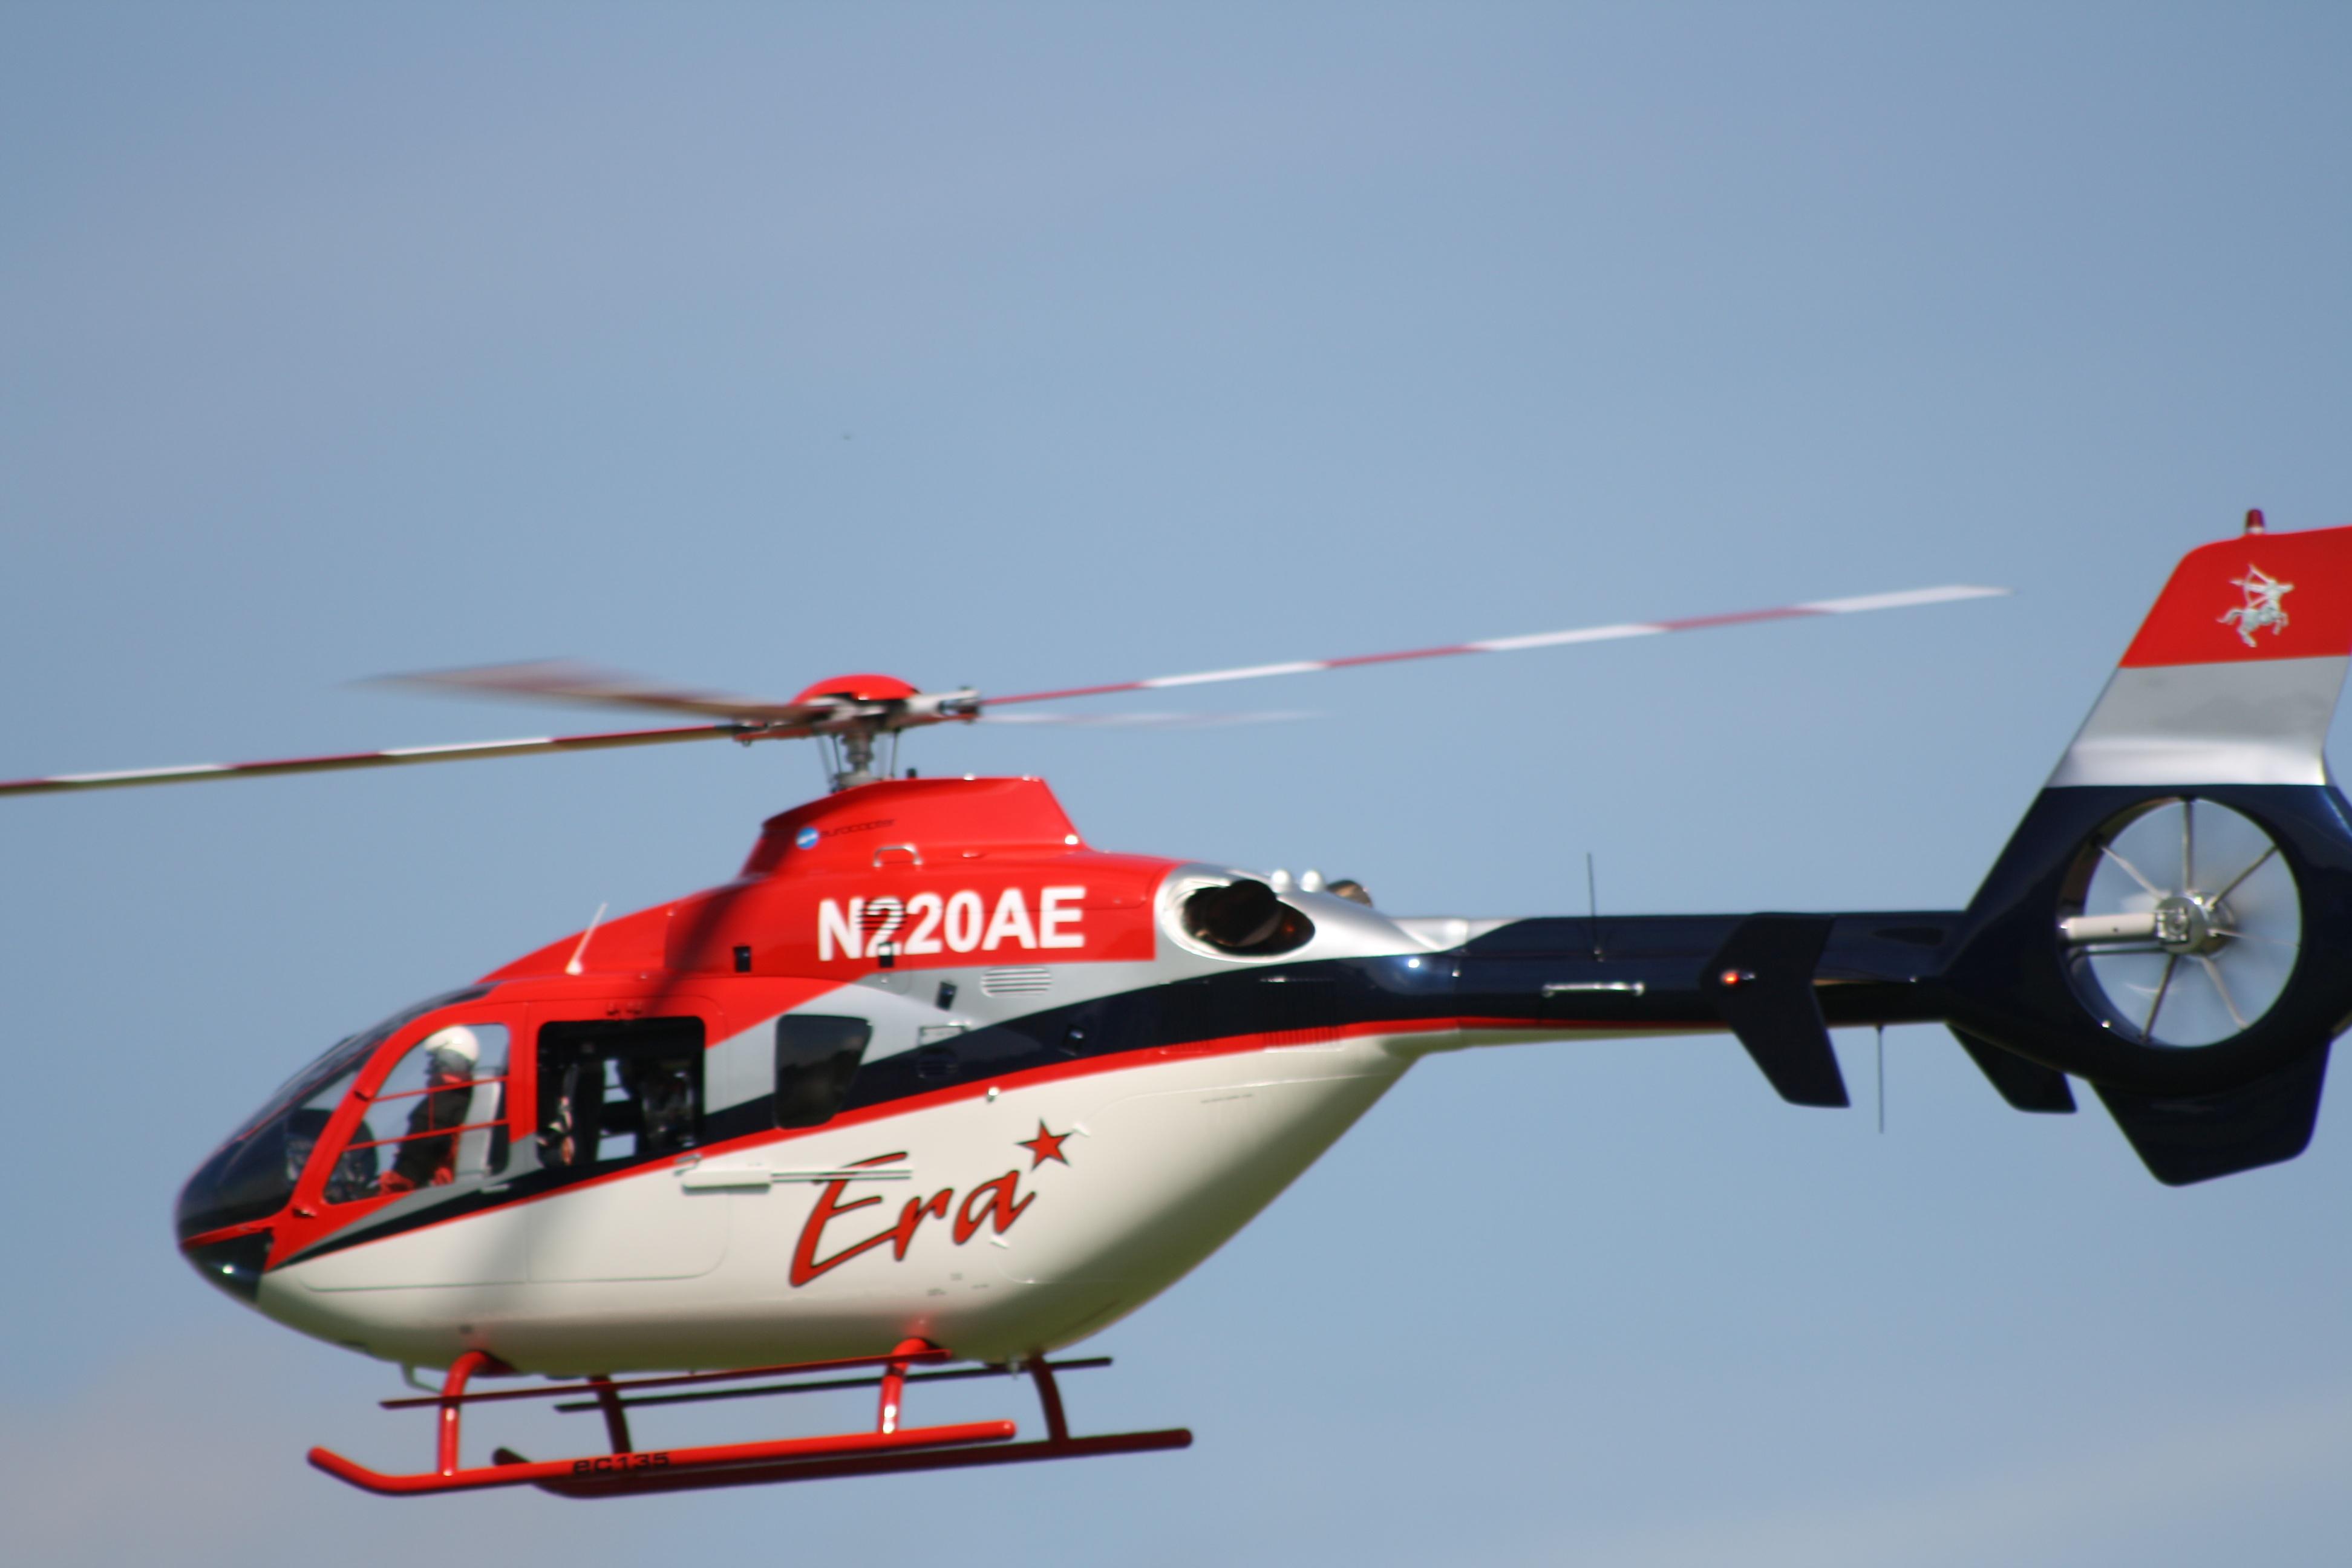 Gambar Pesawat Terbang Kendaraan Penerbangan Mainan Atmosfer